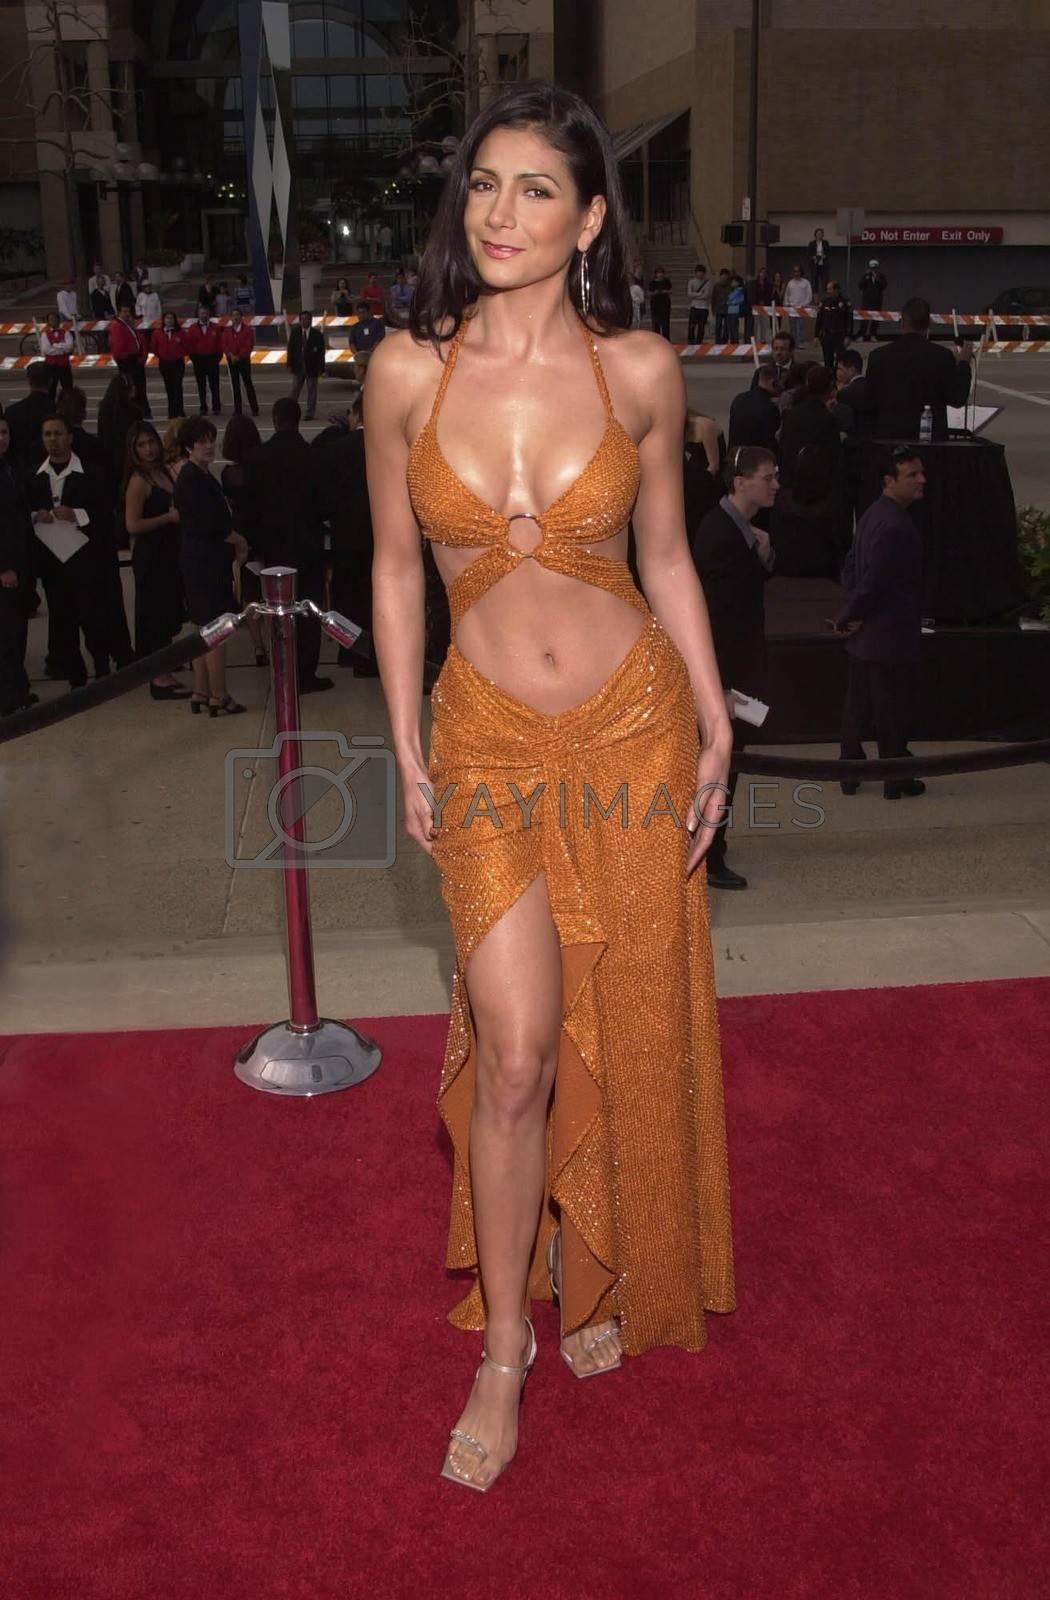 Patricia Monterola at the 2000 Alma Awards, in Pasadena, 04-16-00